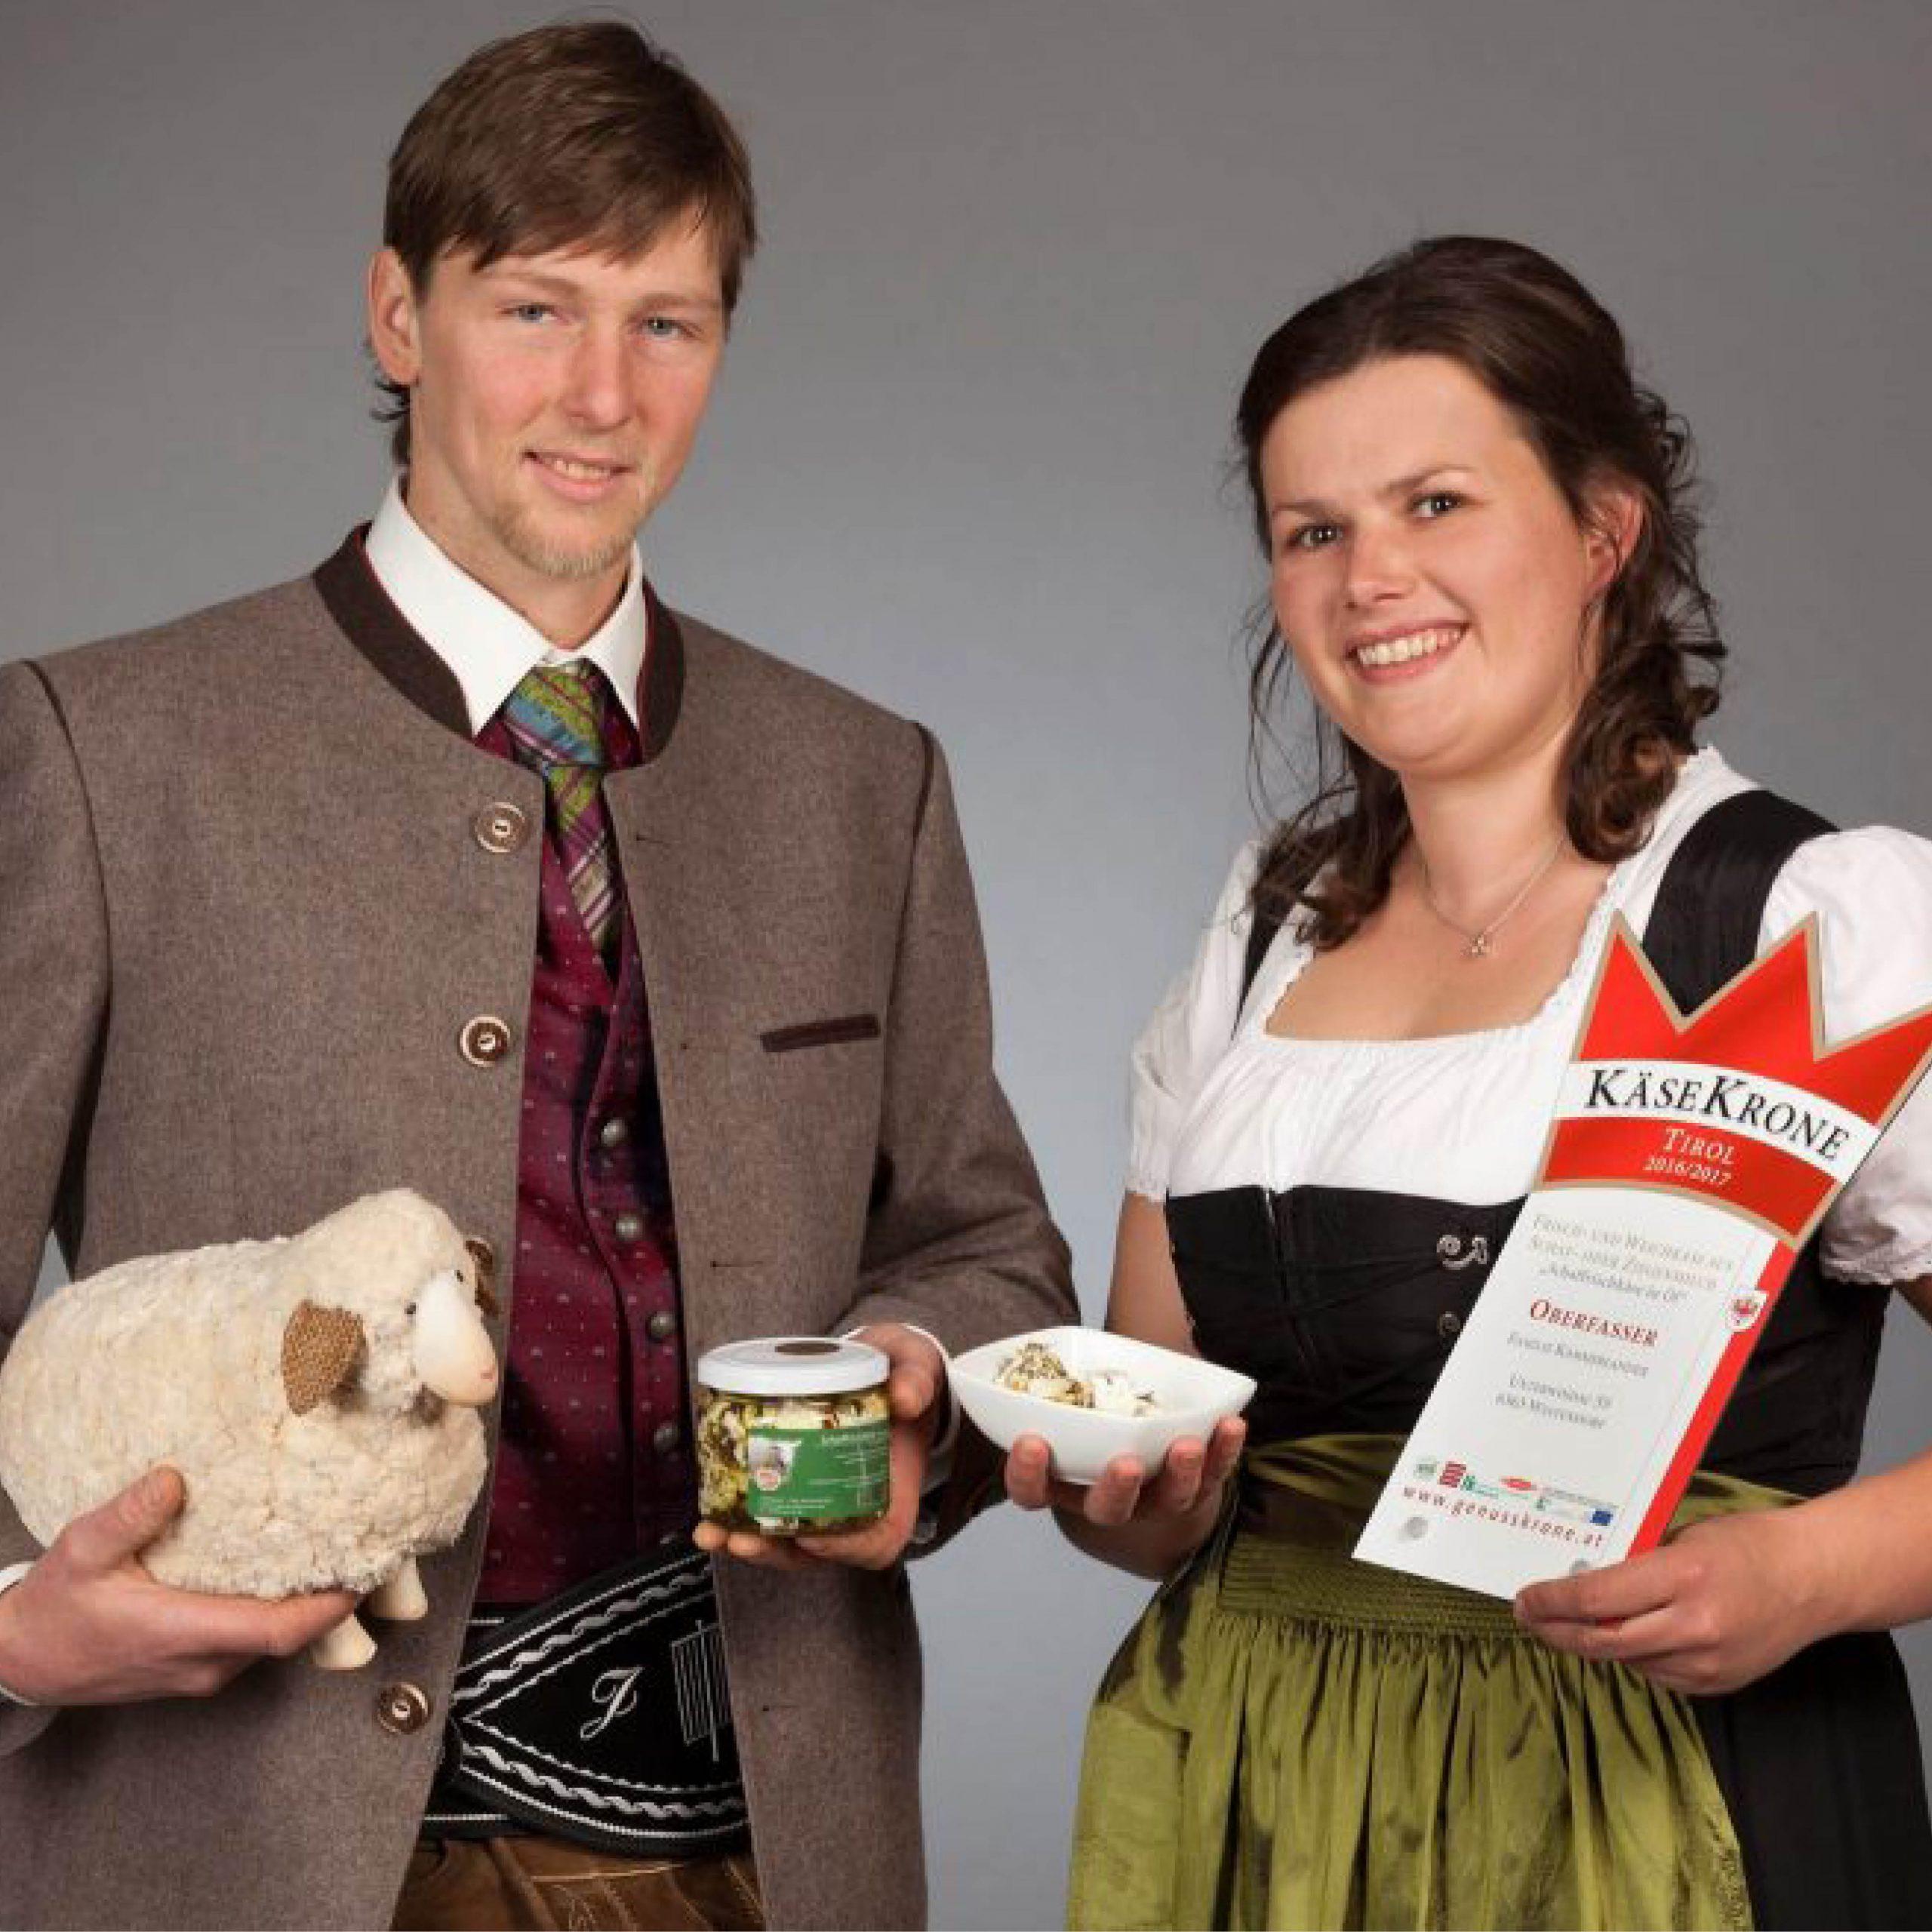 Renate & Hannes